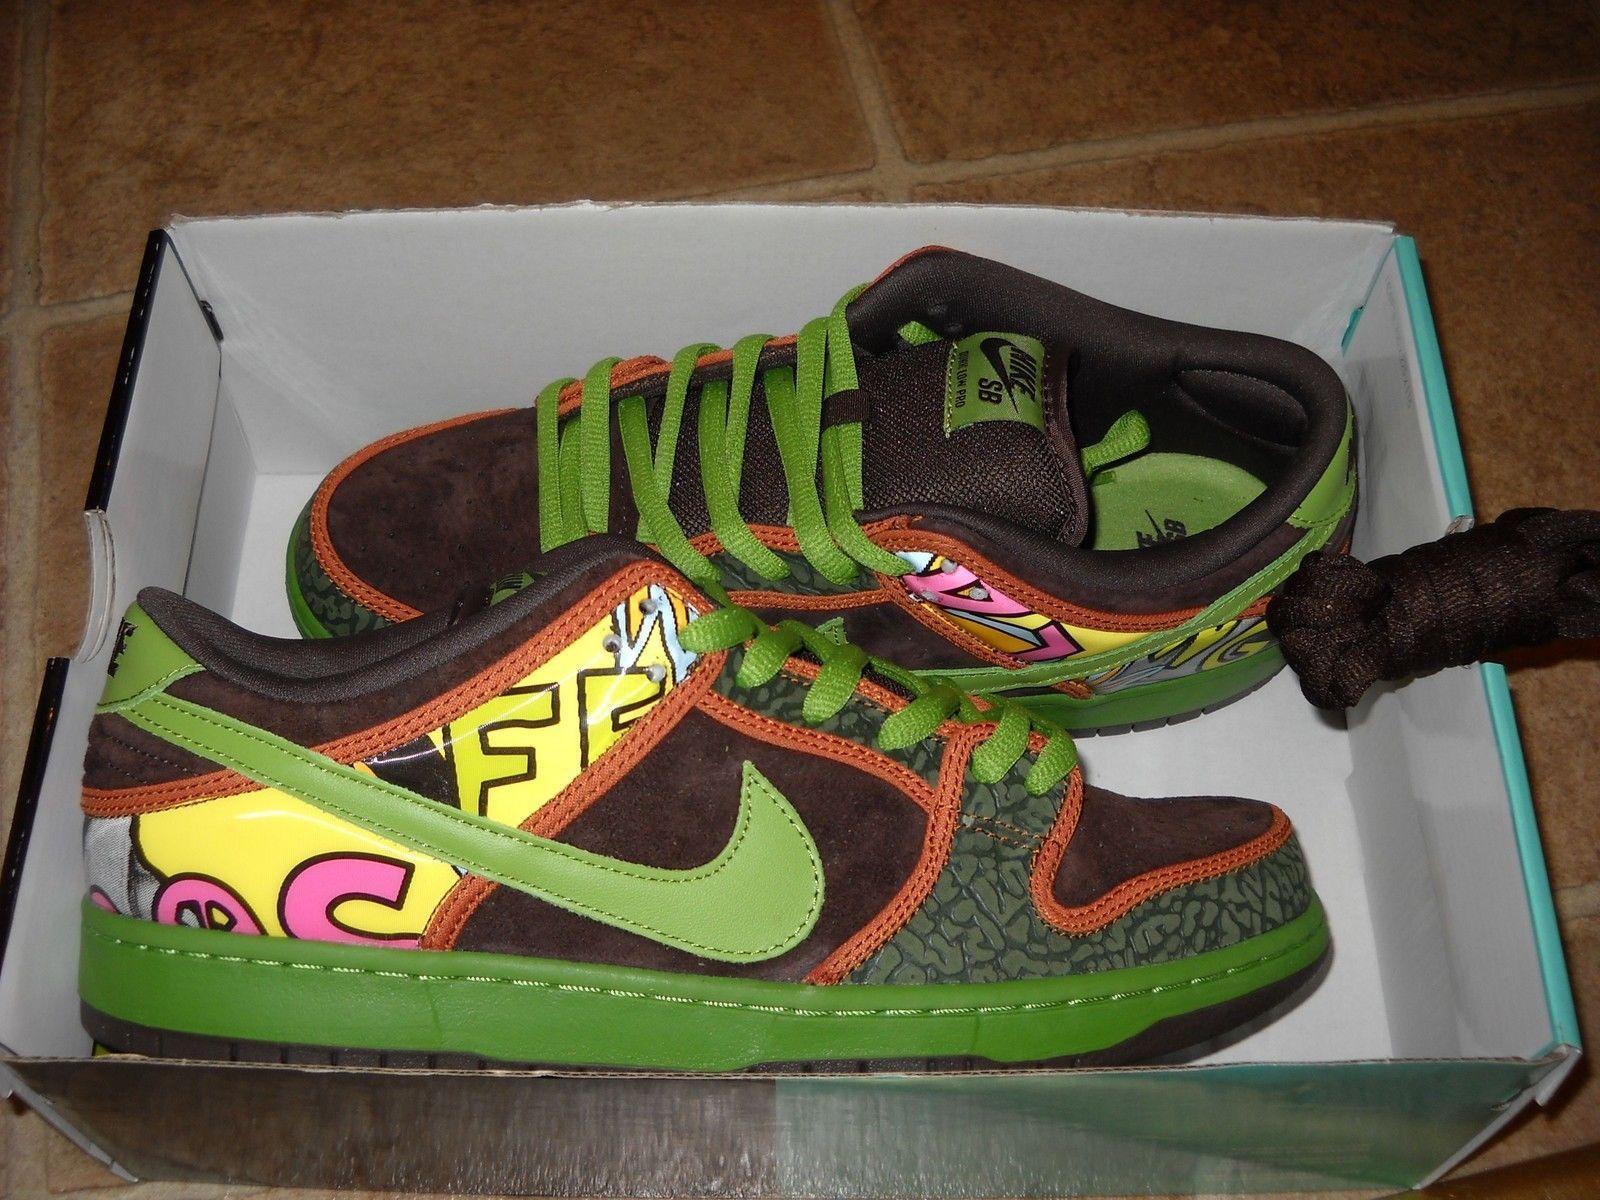 sports shoes 3a089 d78a3 Nike SB Dunk Low PRM Premium DLS SB QS De La Soul (789841 332) Men s Sz.  10.5